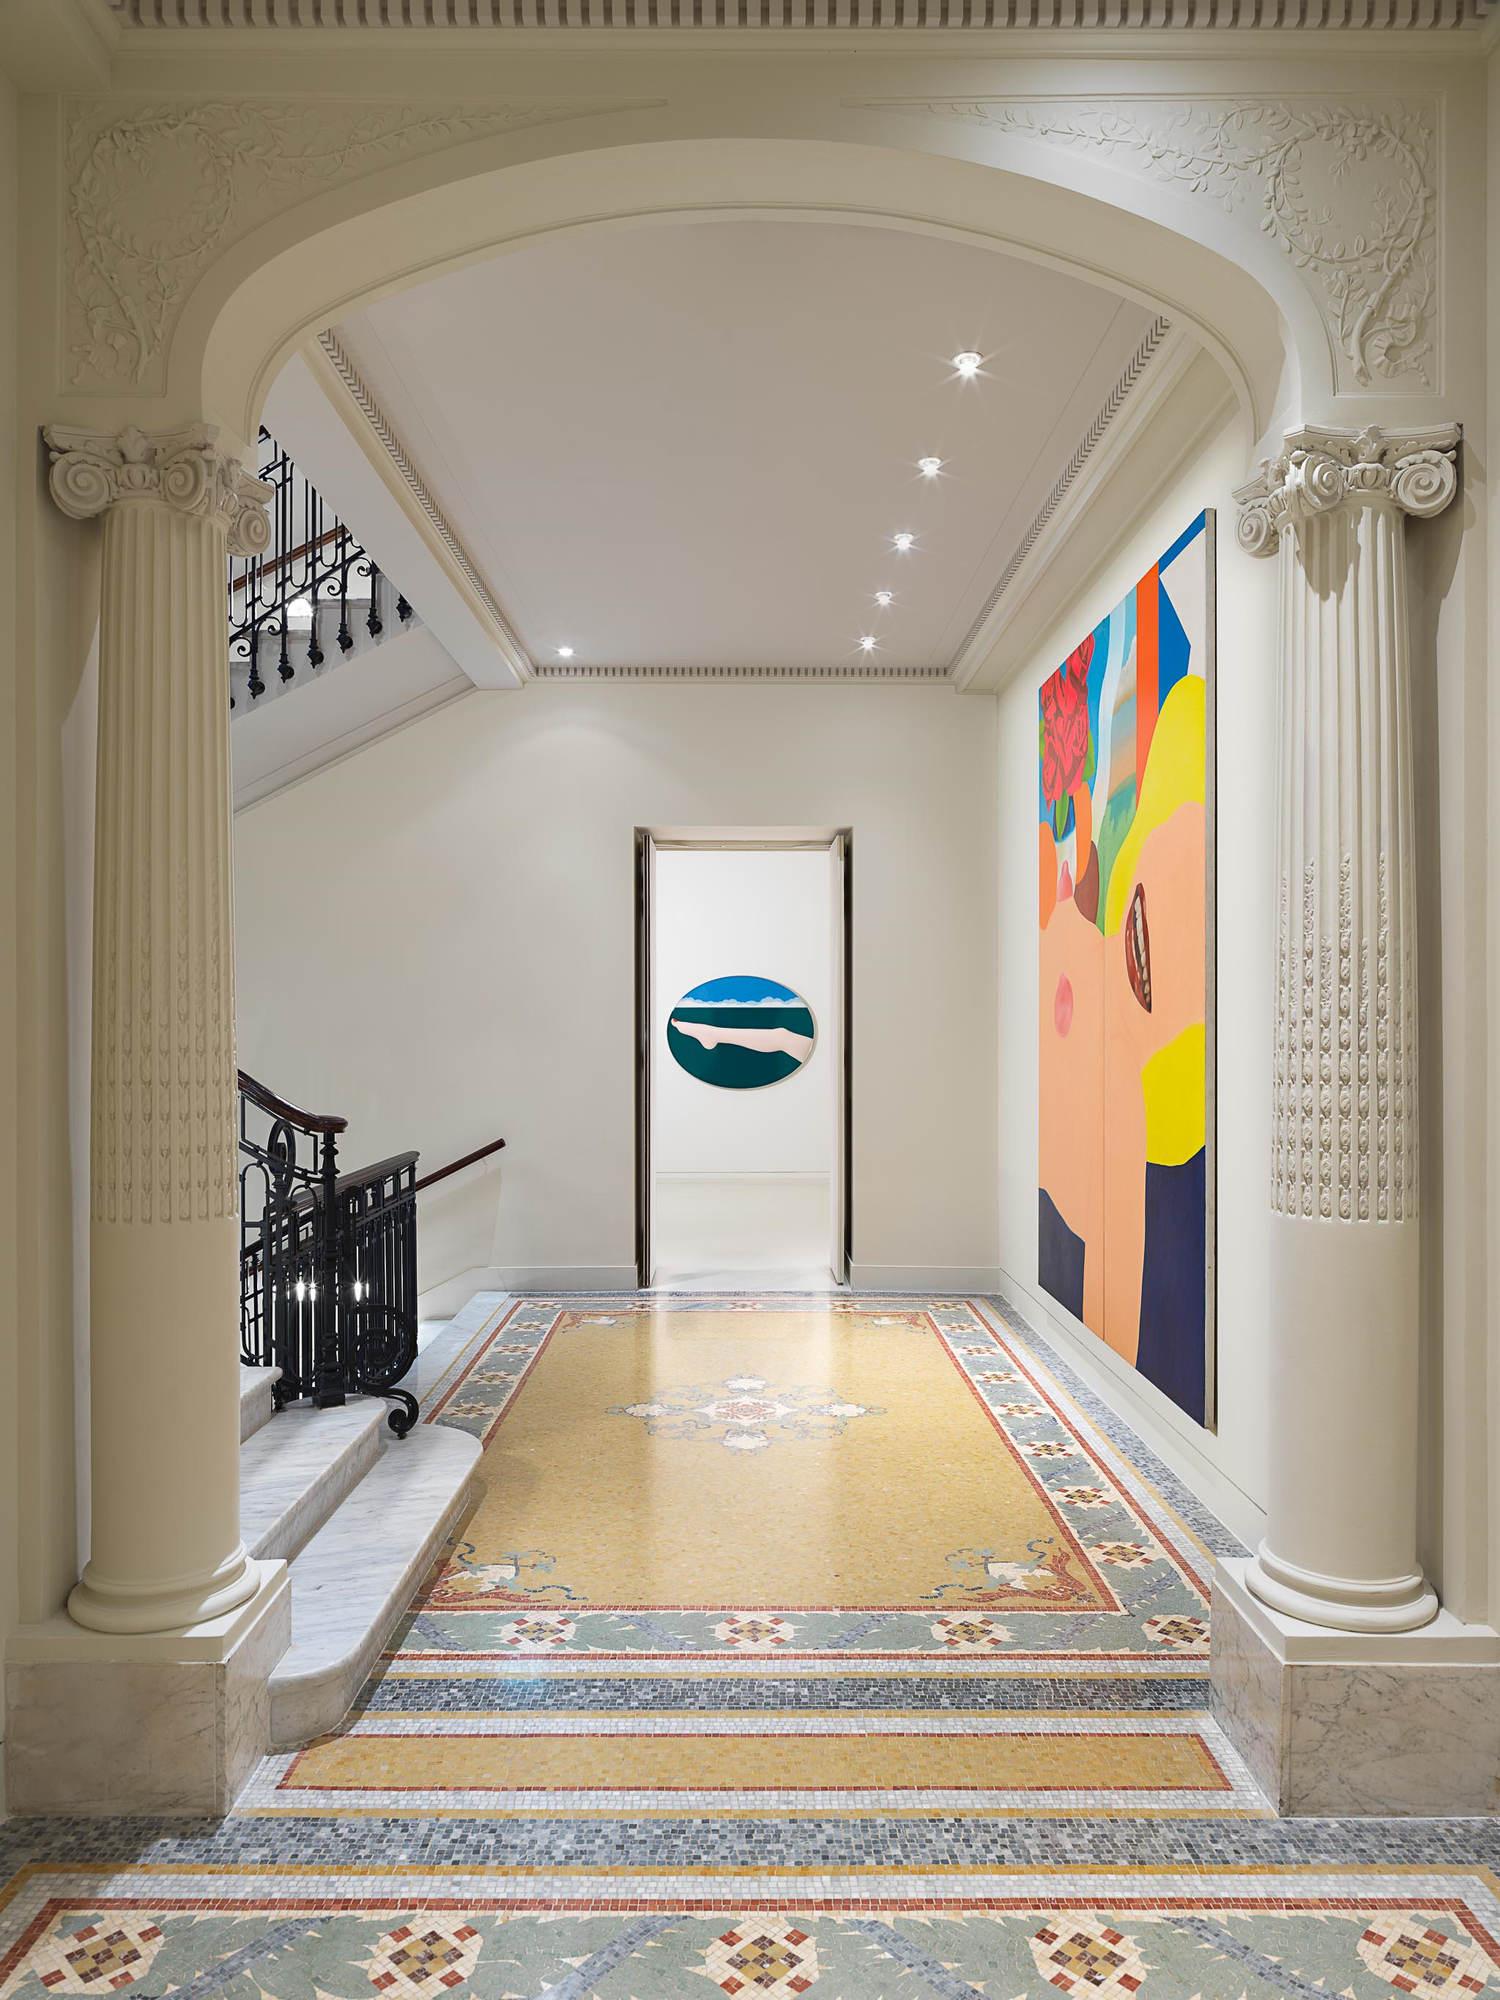 Tom-Wesselman-at-Nouveau-Musee-National-de-Monaco-35.jpg